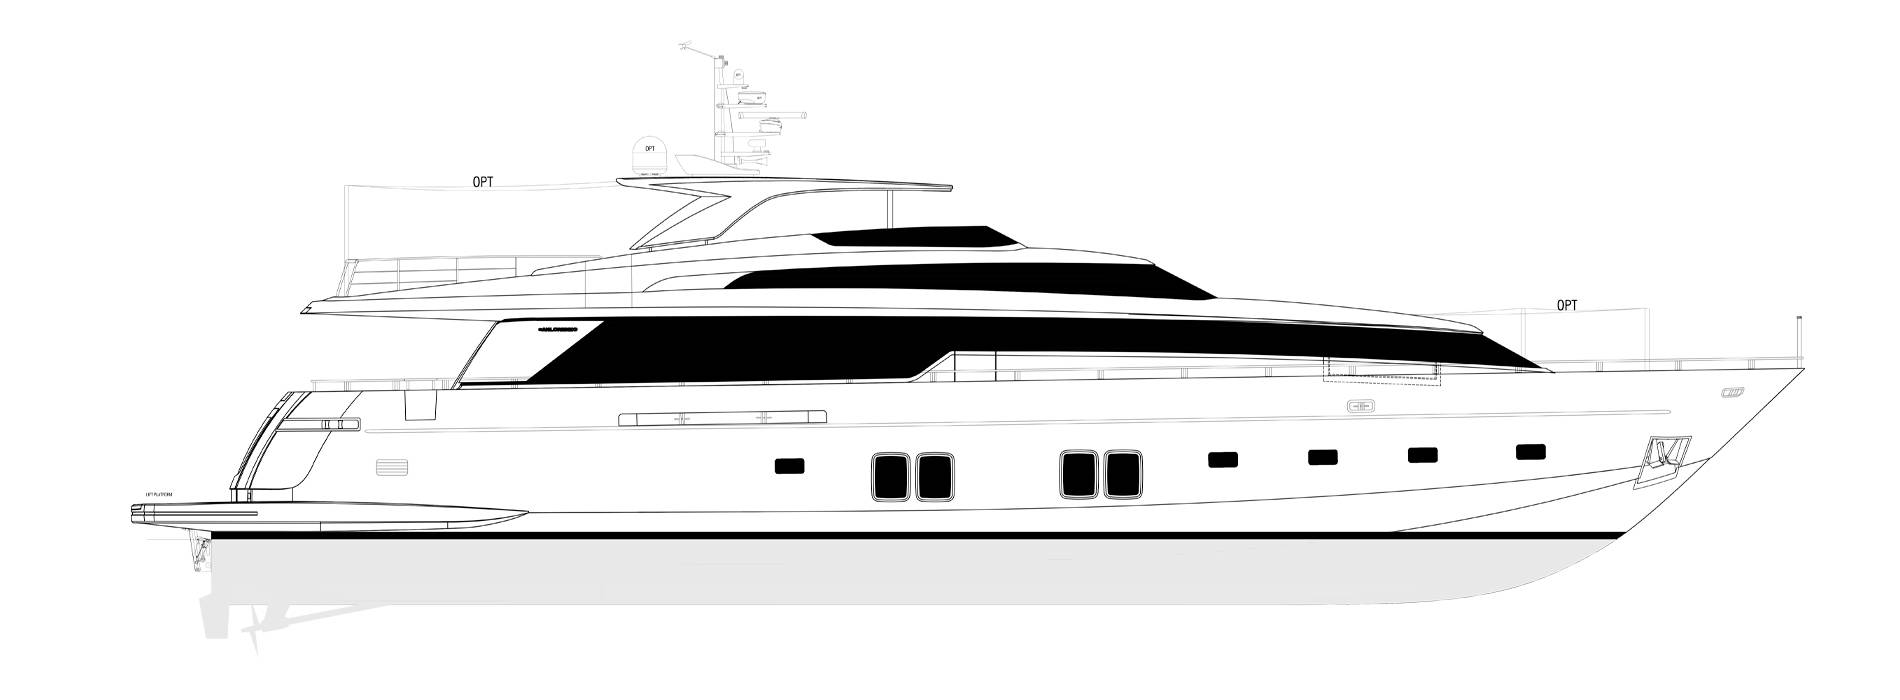 Sanlorenzo Yachts SL106-625 Profile